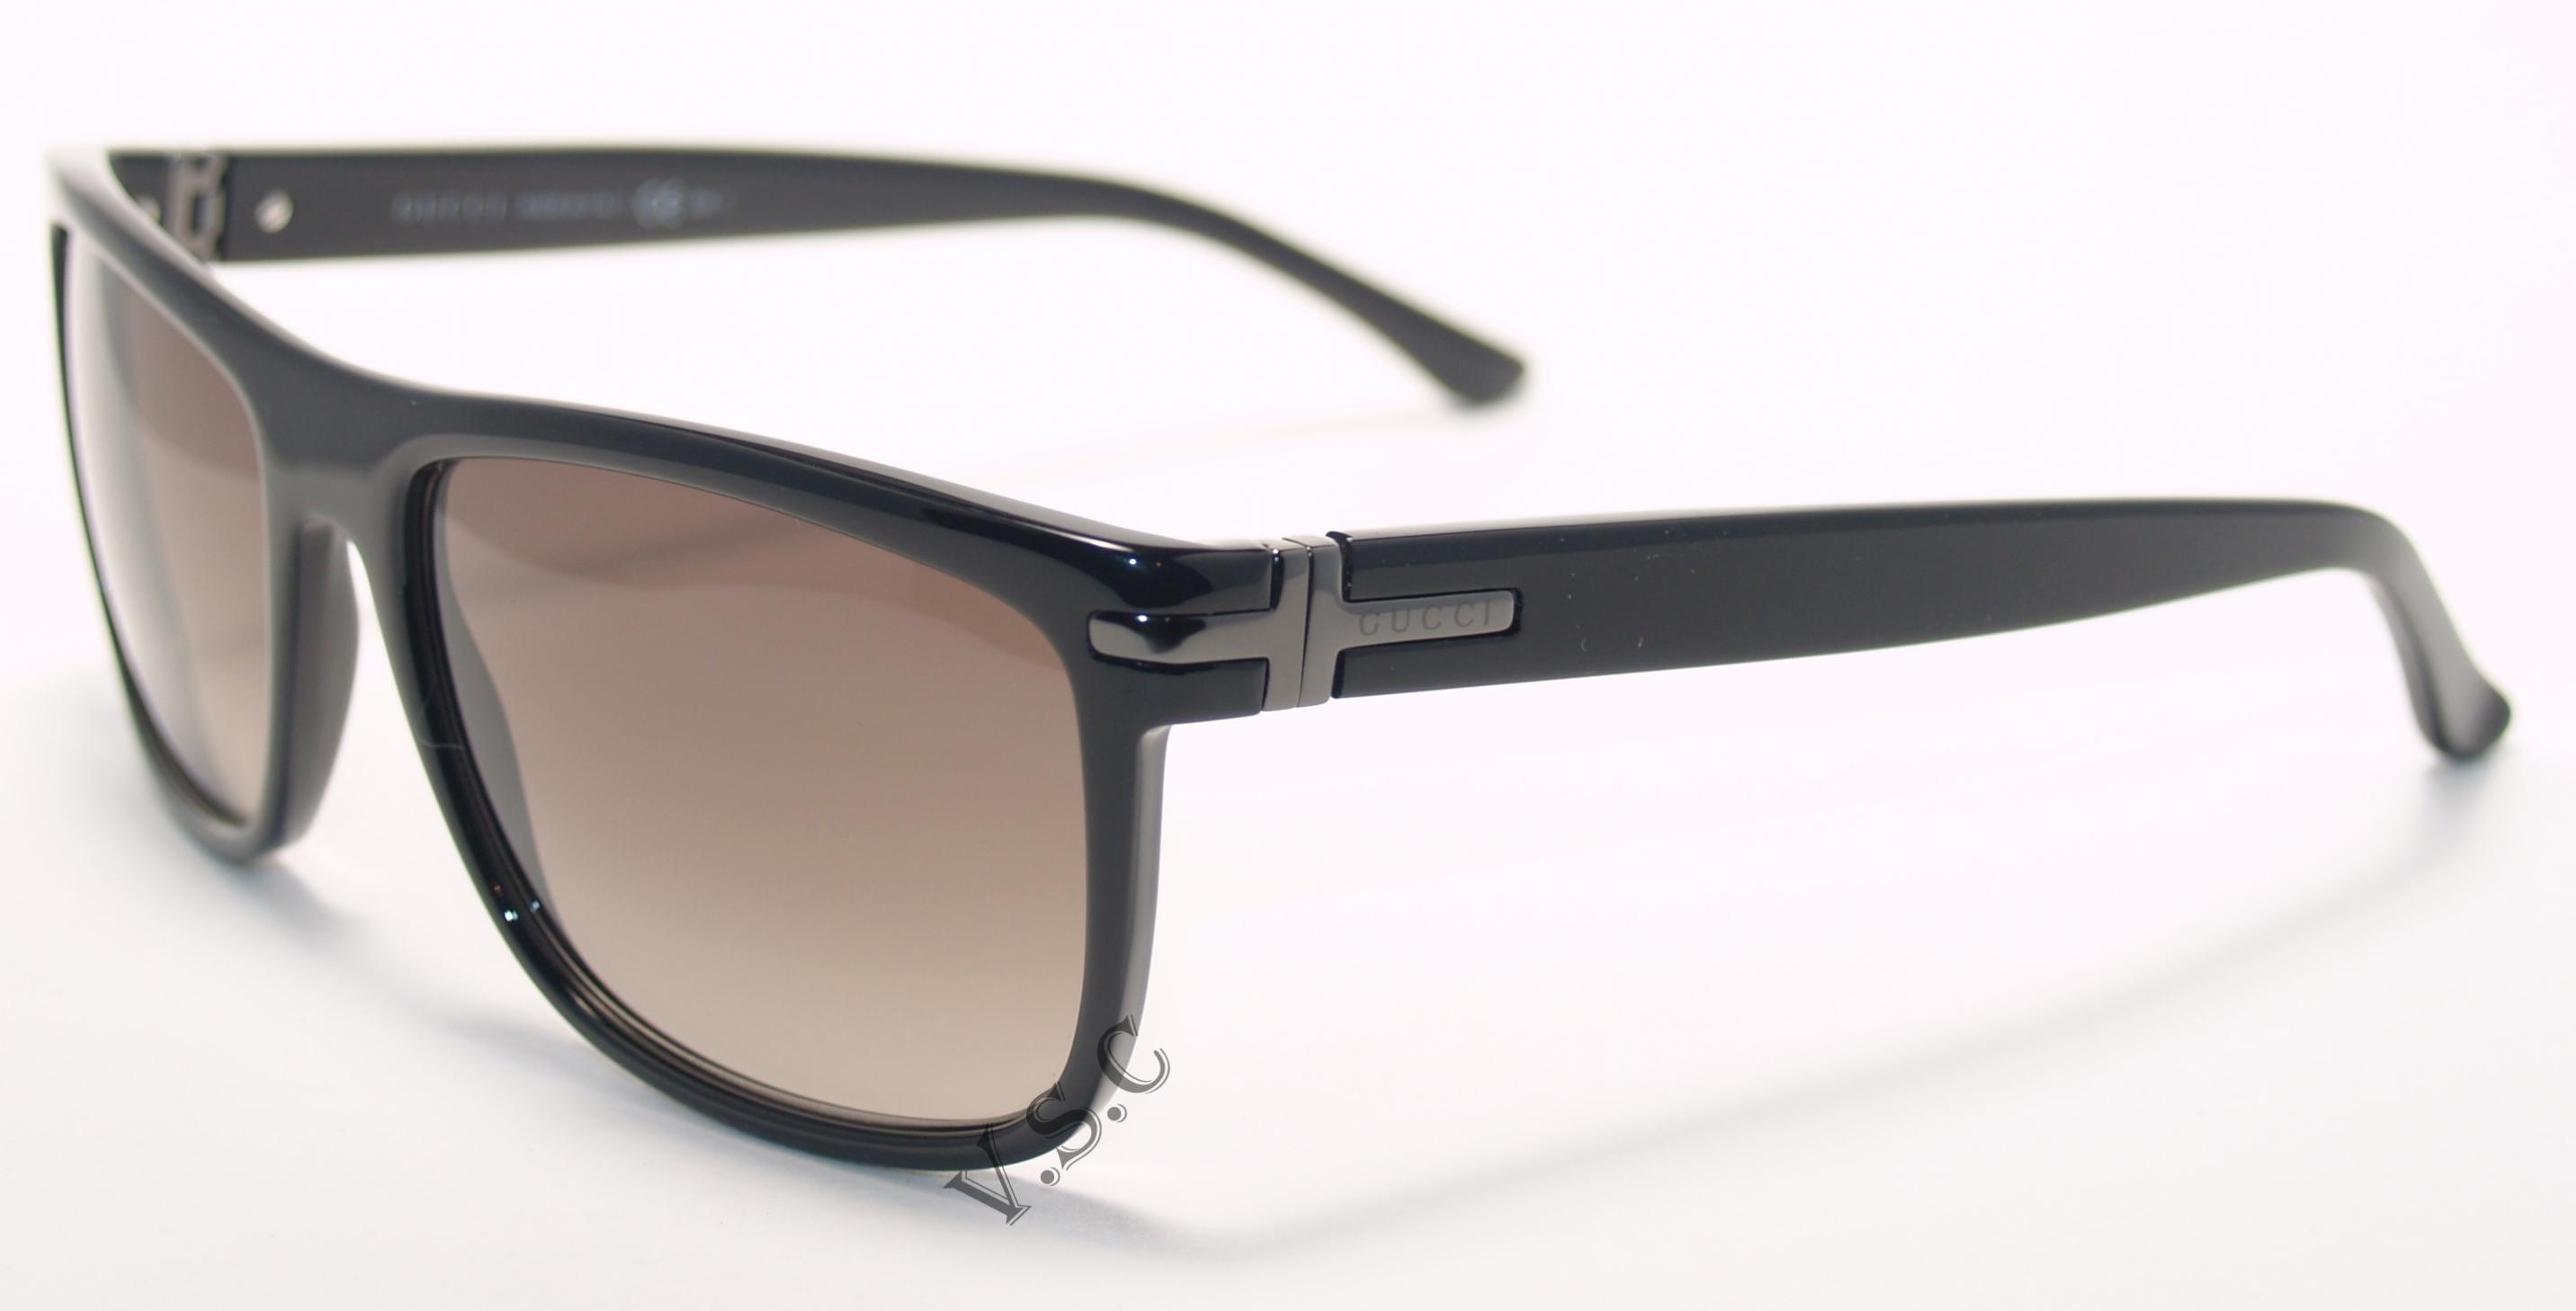 0dd71b6185 Gucci 1027 Sunglasses